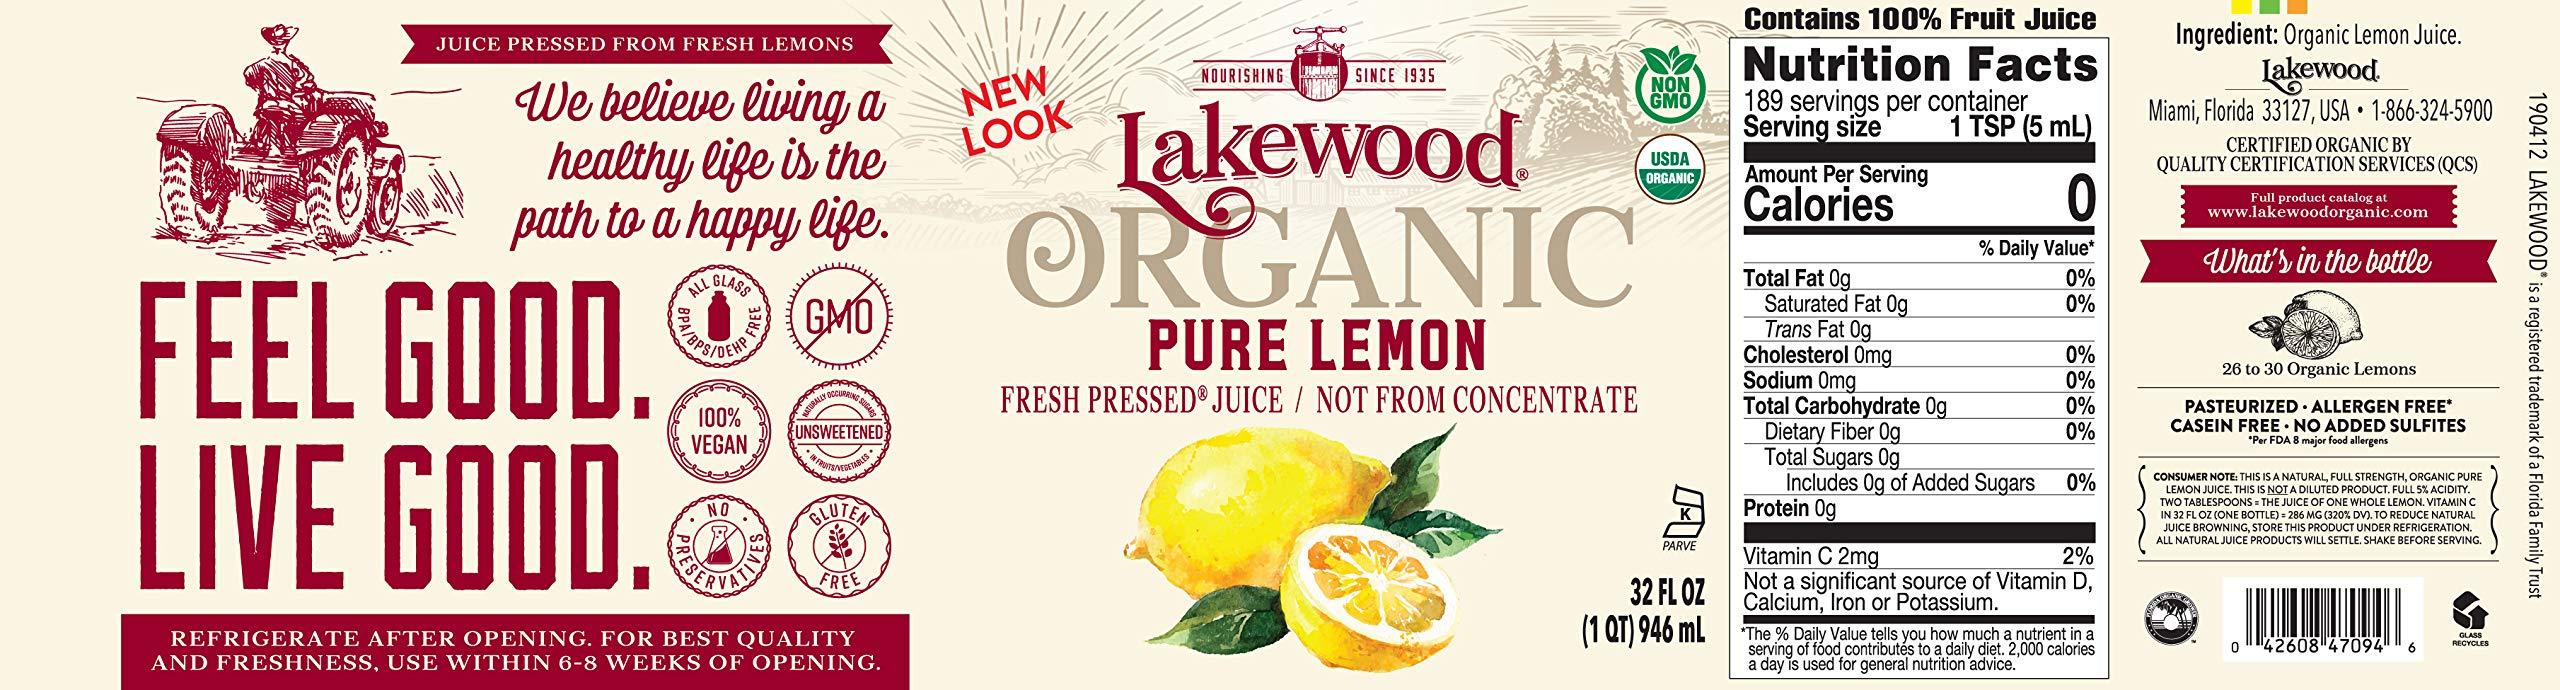 Lakewood Organic Pure Lemon, 32 Ounce (Pack of 6) by Lakewood (Image #4)